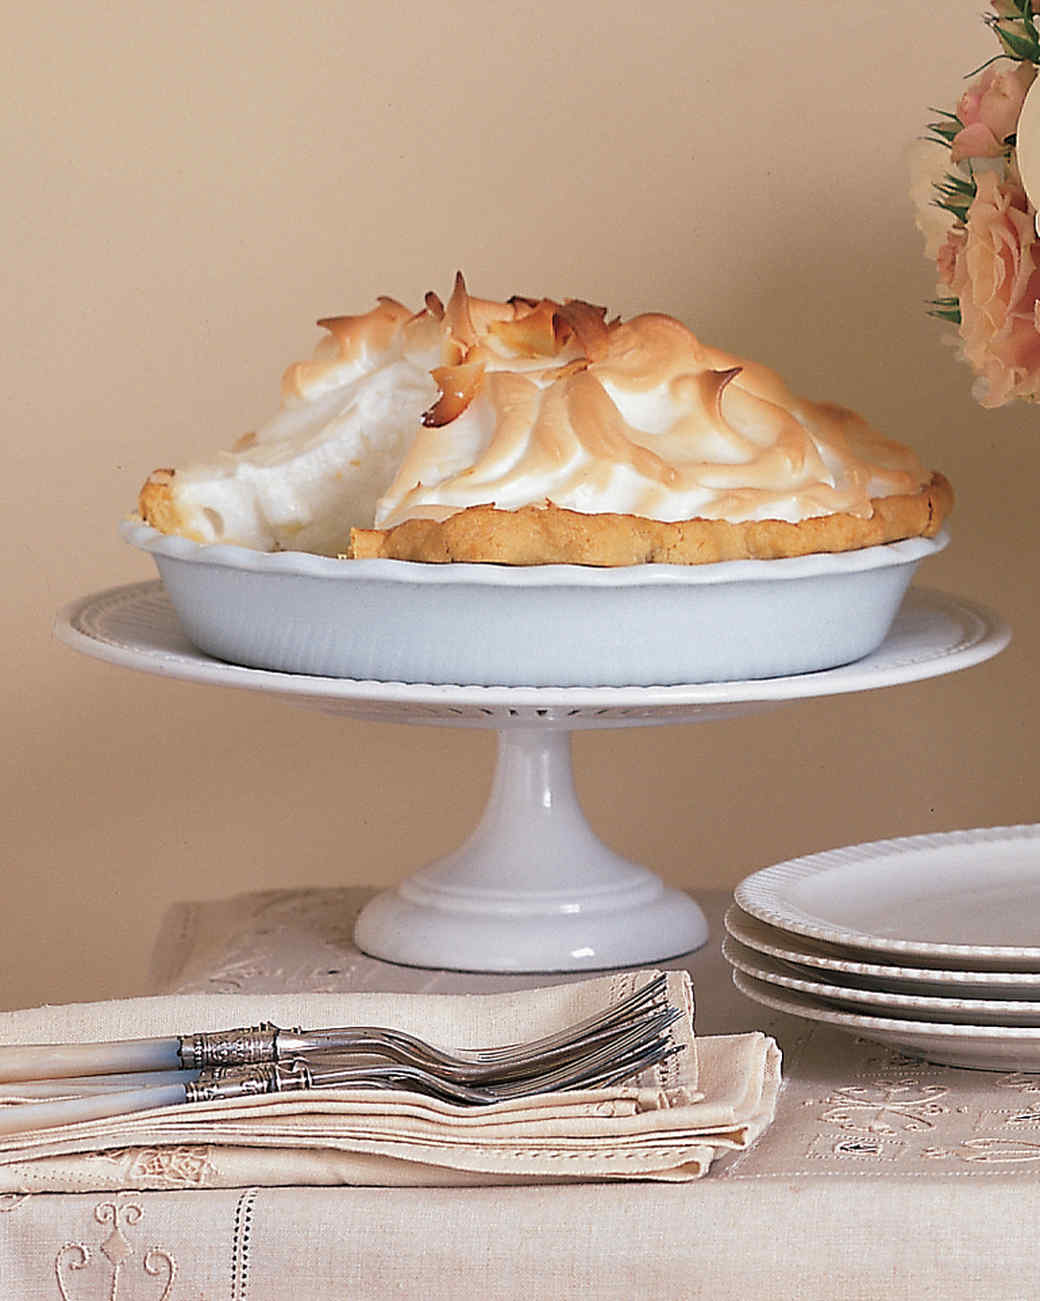 coconut-cream-pie-0499-mla97715.jpg